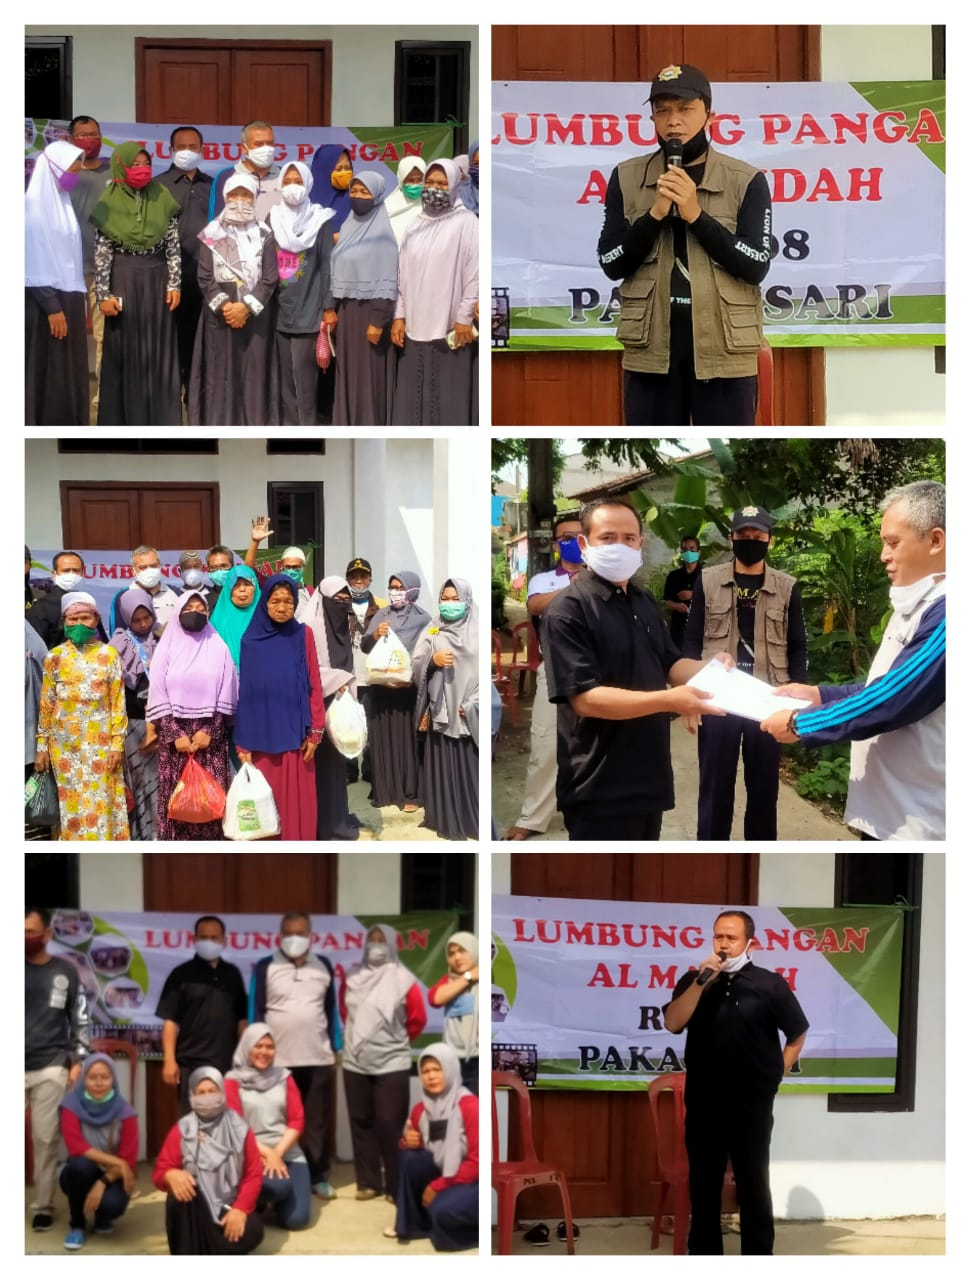 Launching Lumbung Pangan Al Maidah Bagikan 90 Paket Sembako